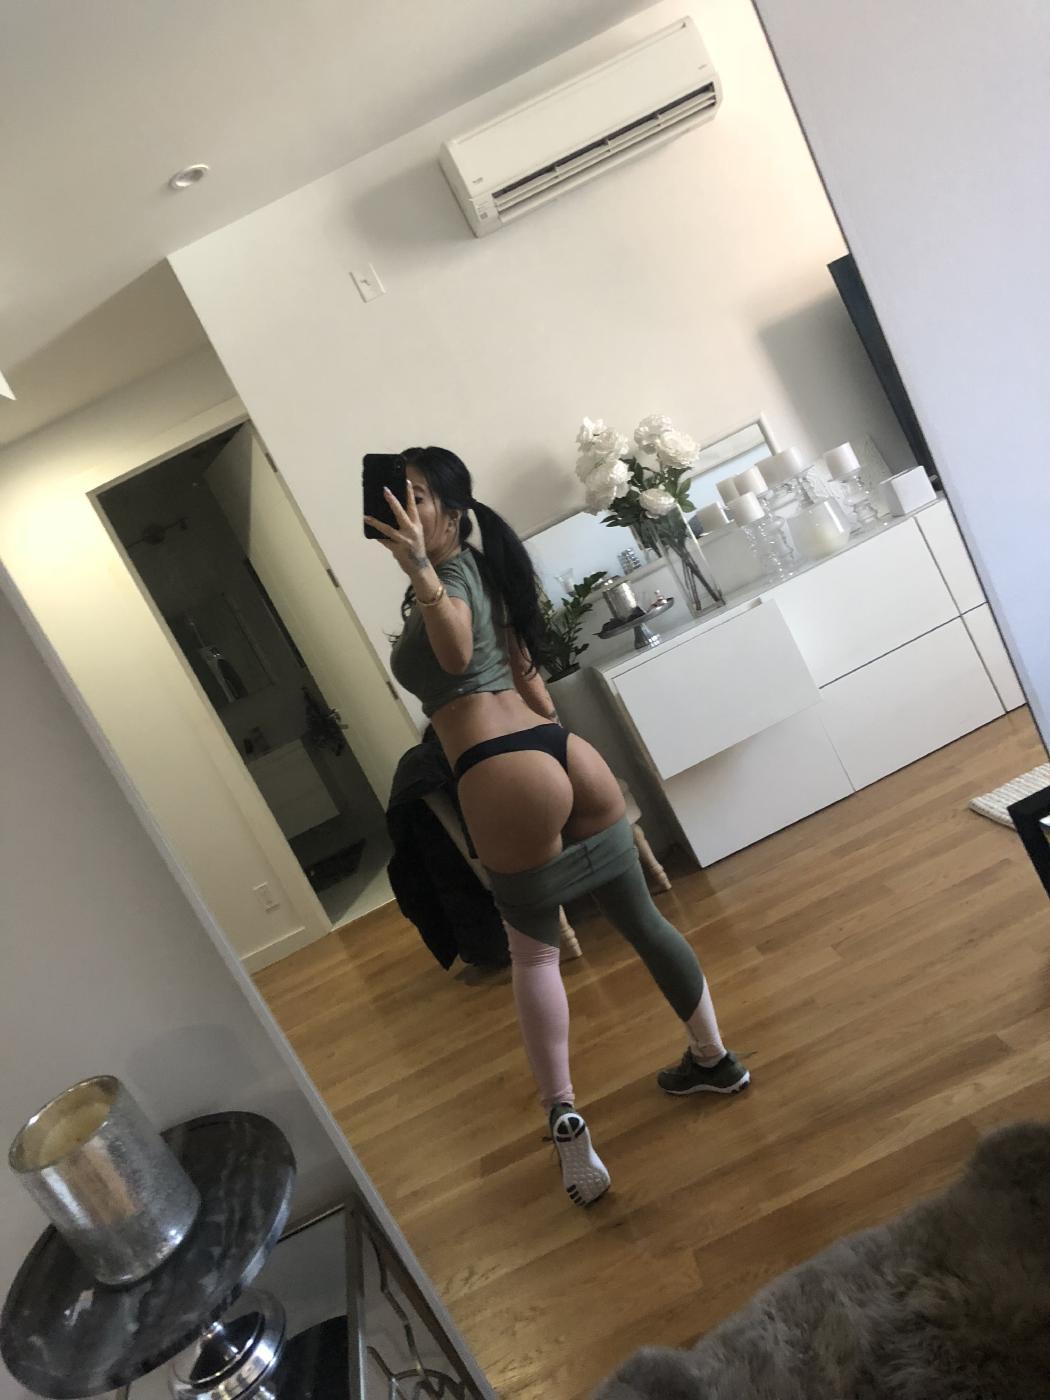 Asa Akira Nude Mirror Selfie Onlyfans Set Leaked Iamqxu